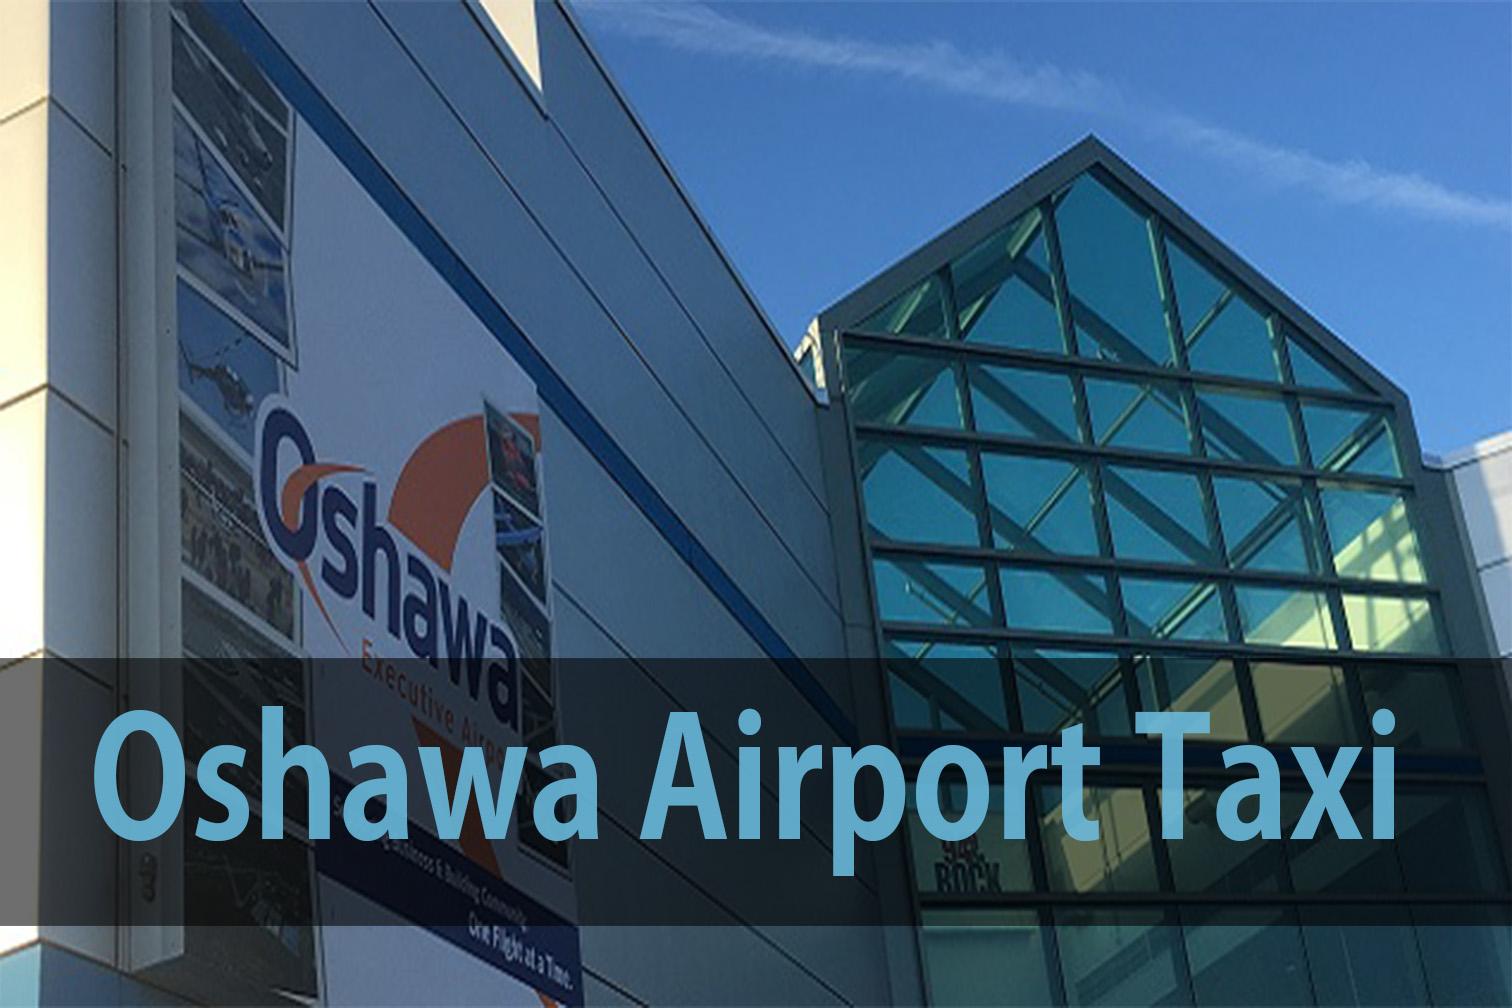 oshawa airport taxi